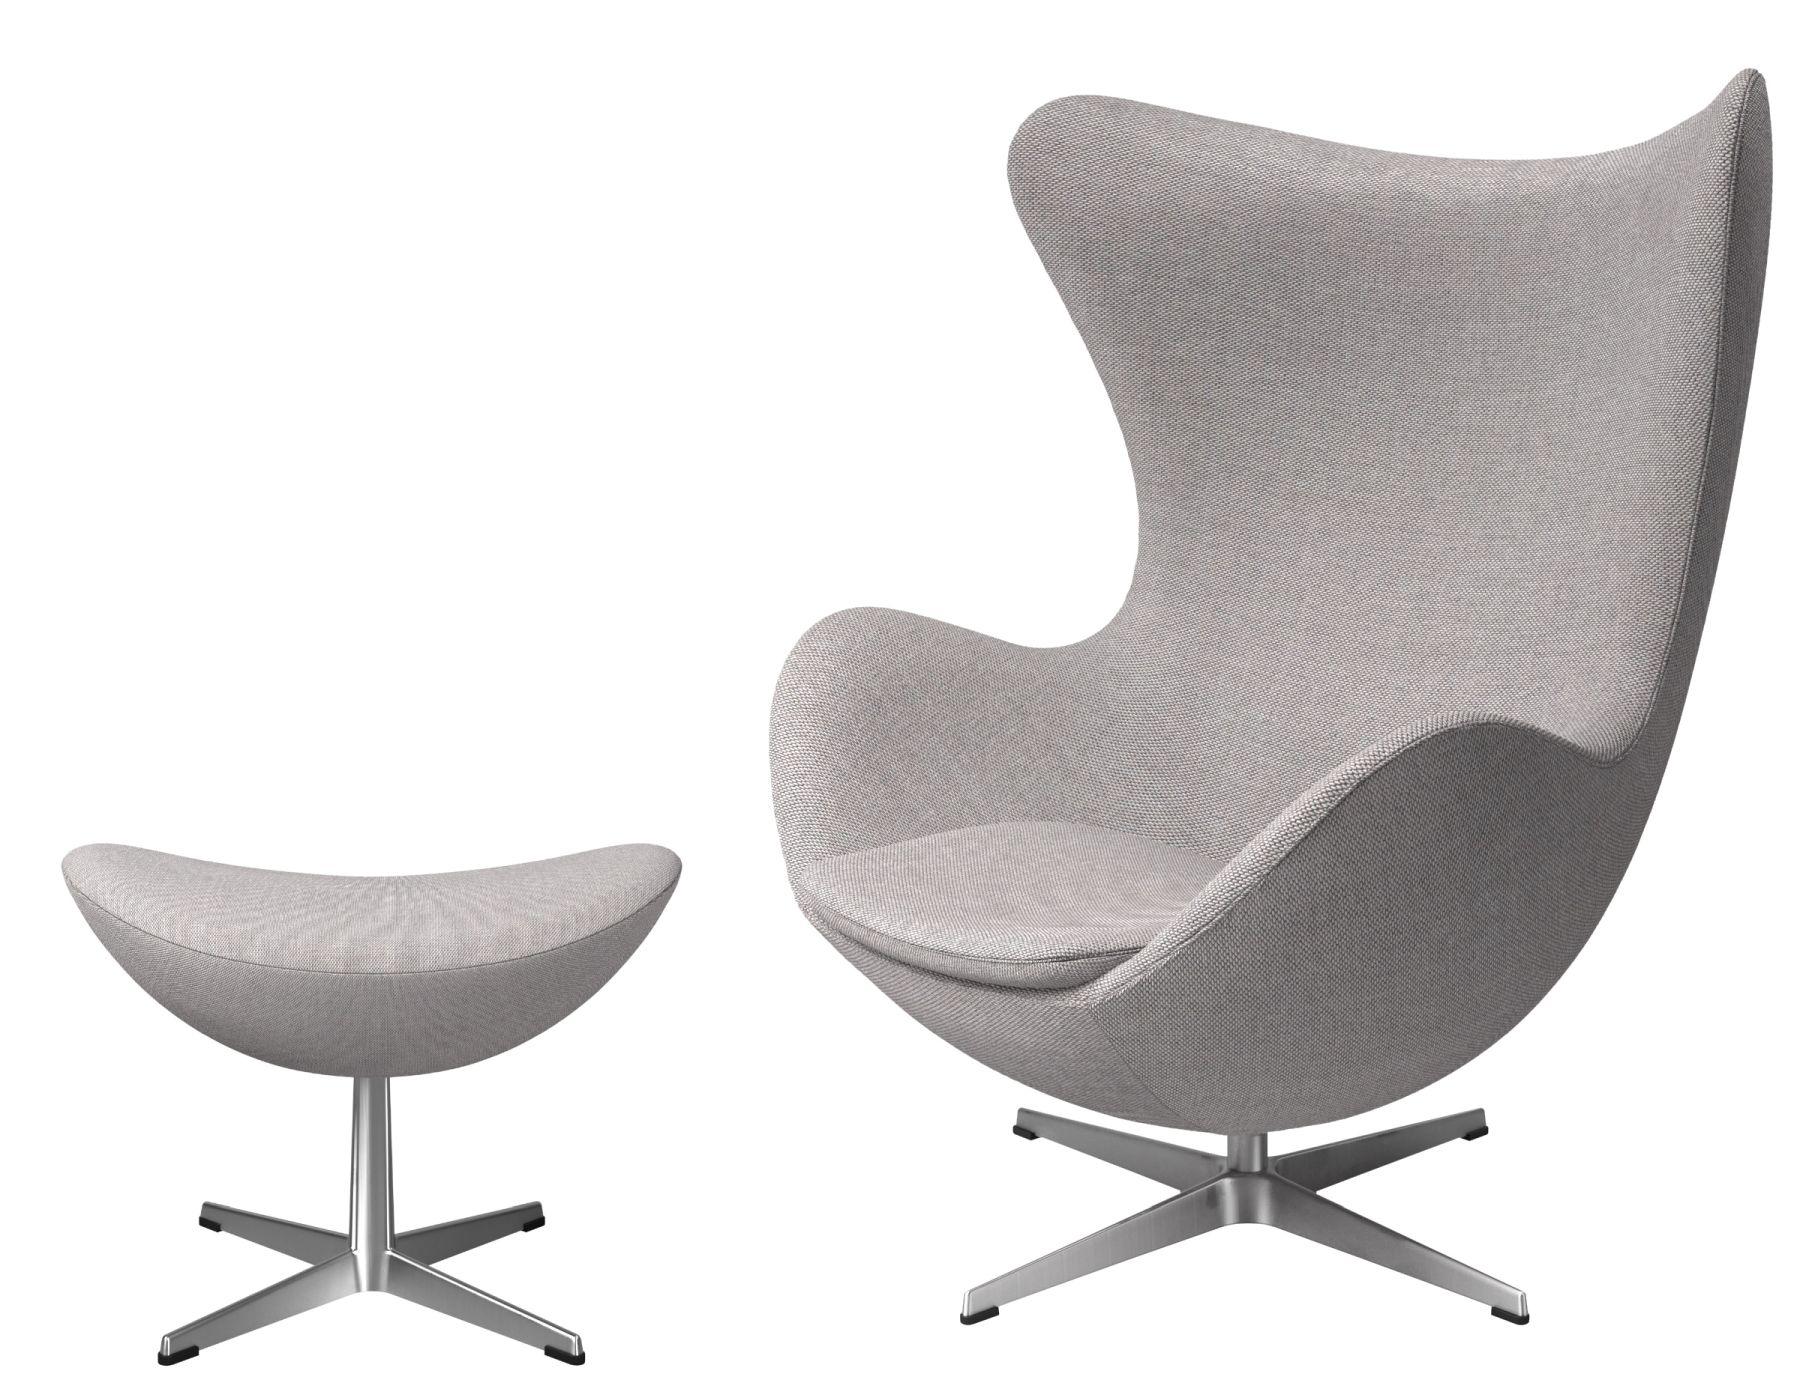 Egg Chair mit Hocker Aktionsmodell Re-wool Textile Stoff Fritz Hansen